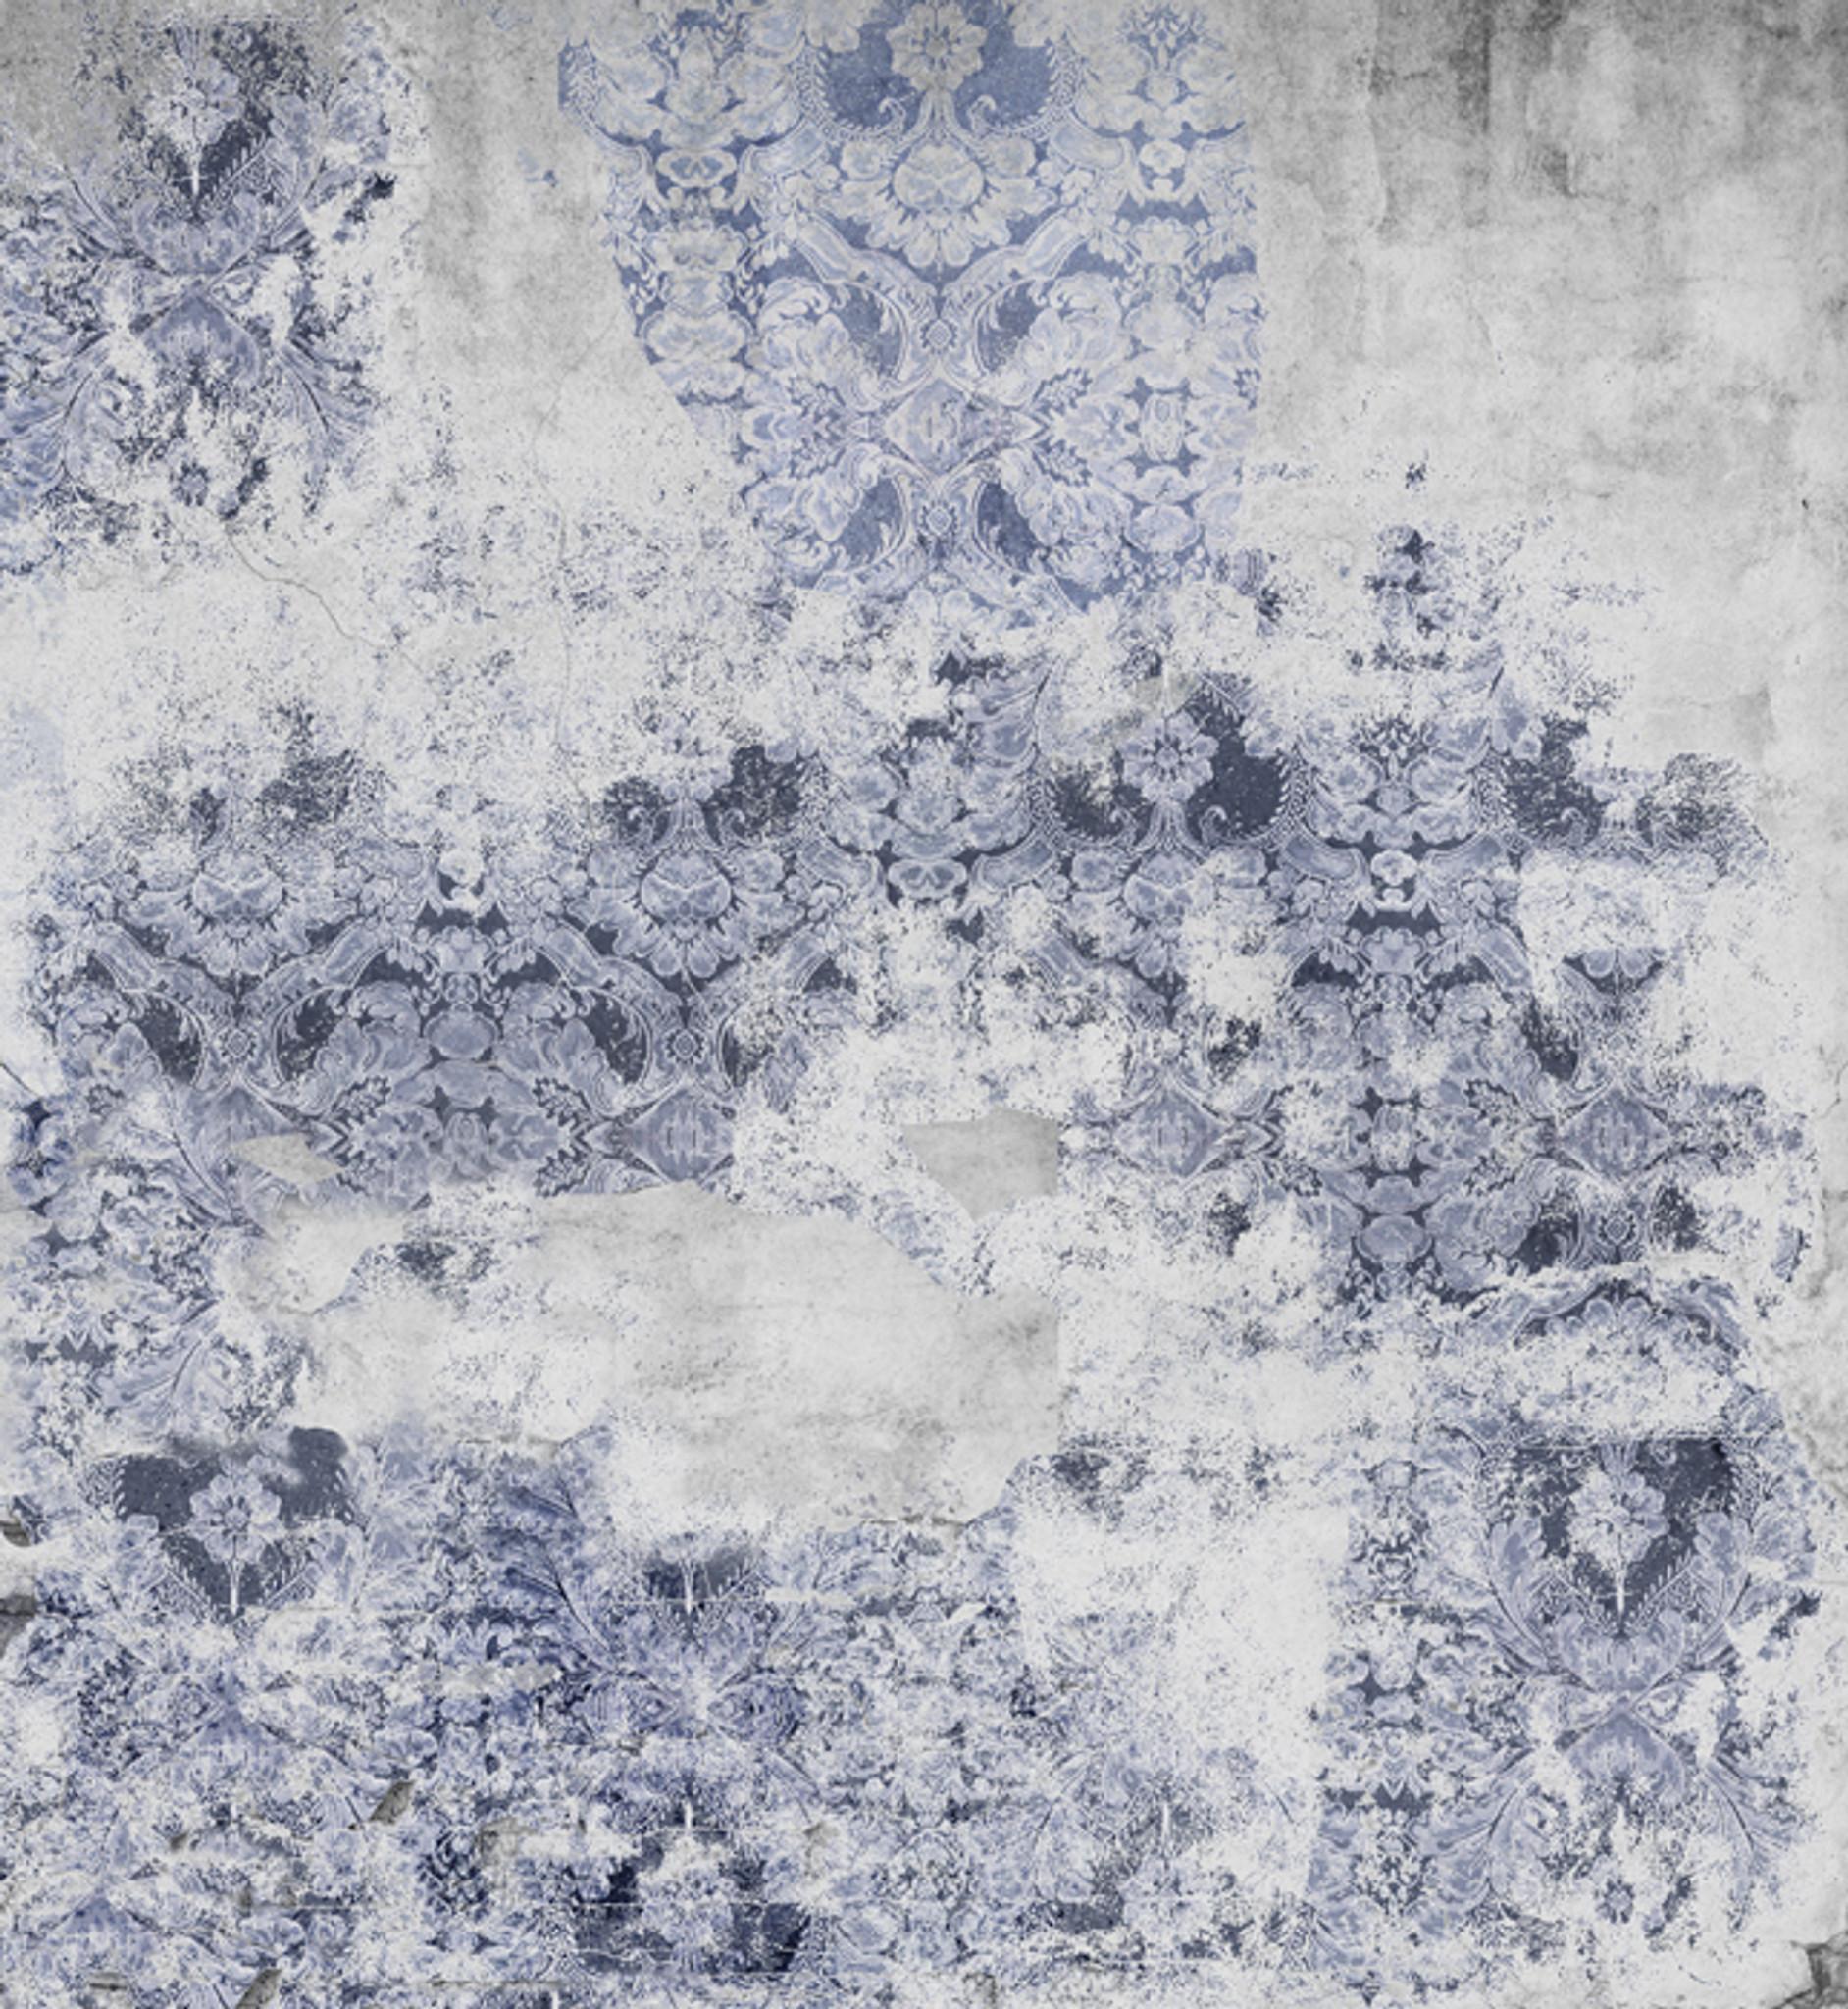 Wallpaper - Damaged Goods in Blue